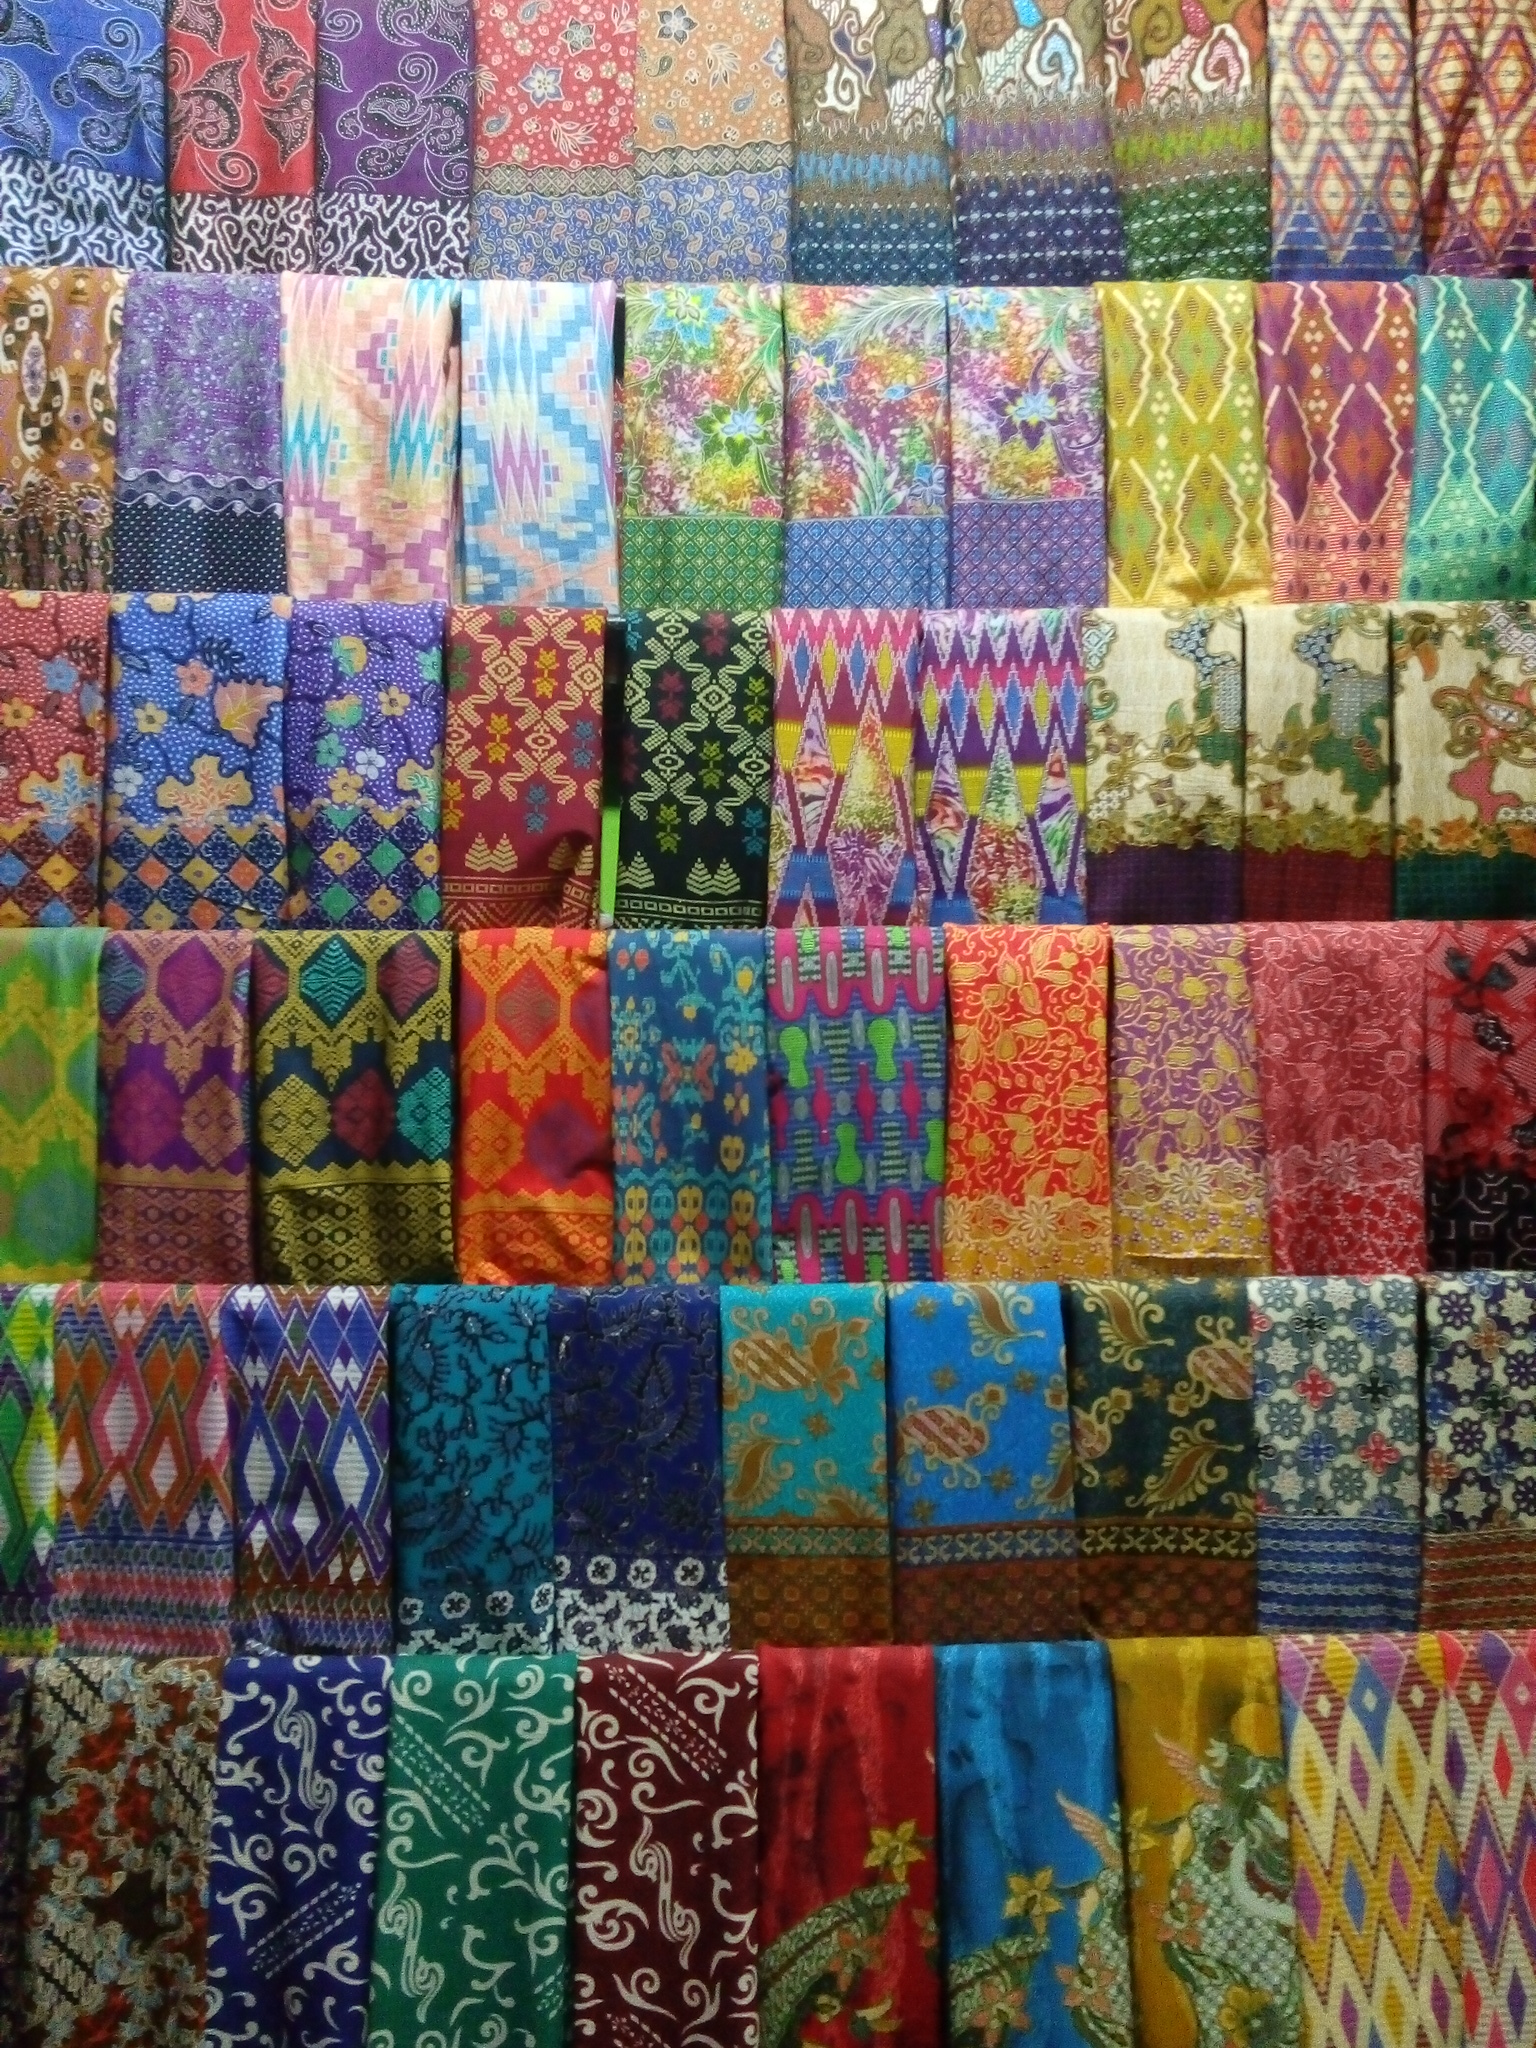 belanja kain batik murah  Pusat Grosir Baju Batik Modern